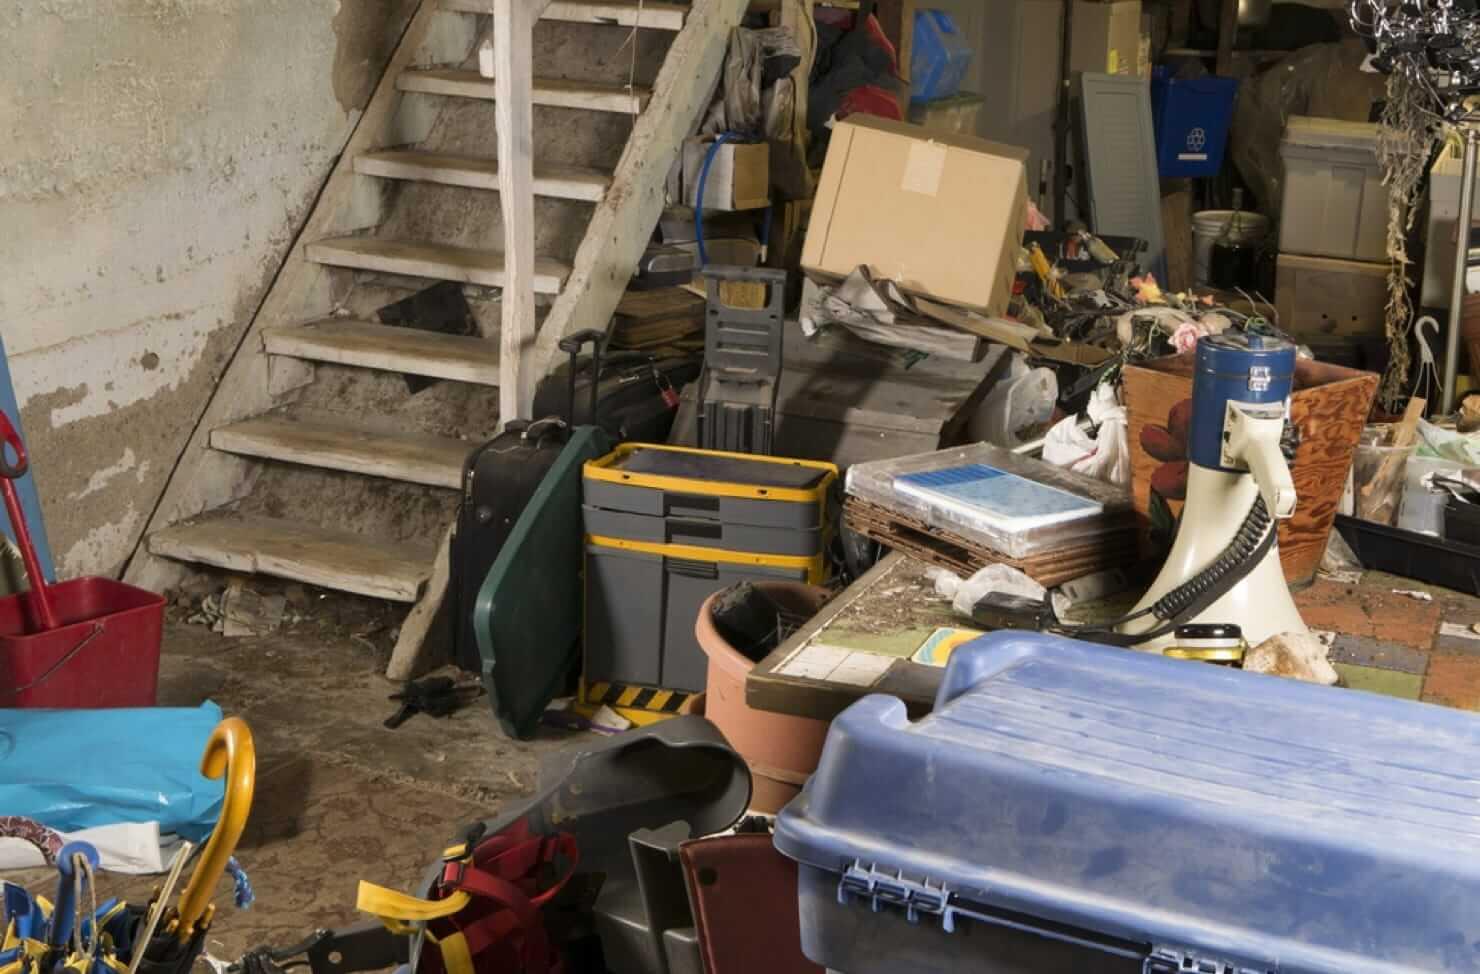 untidy basement